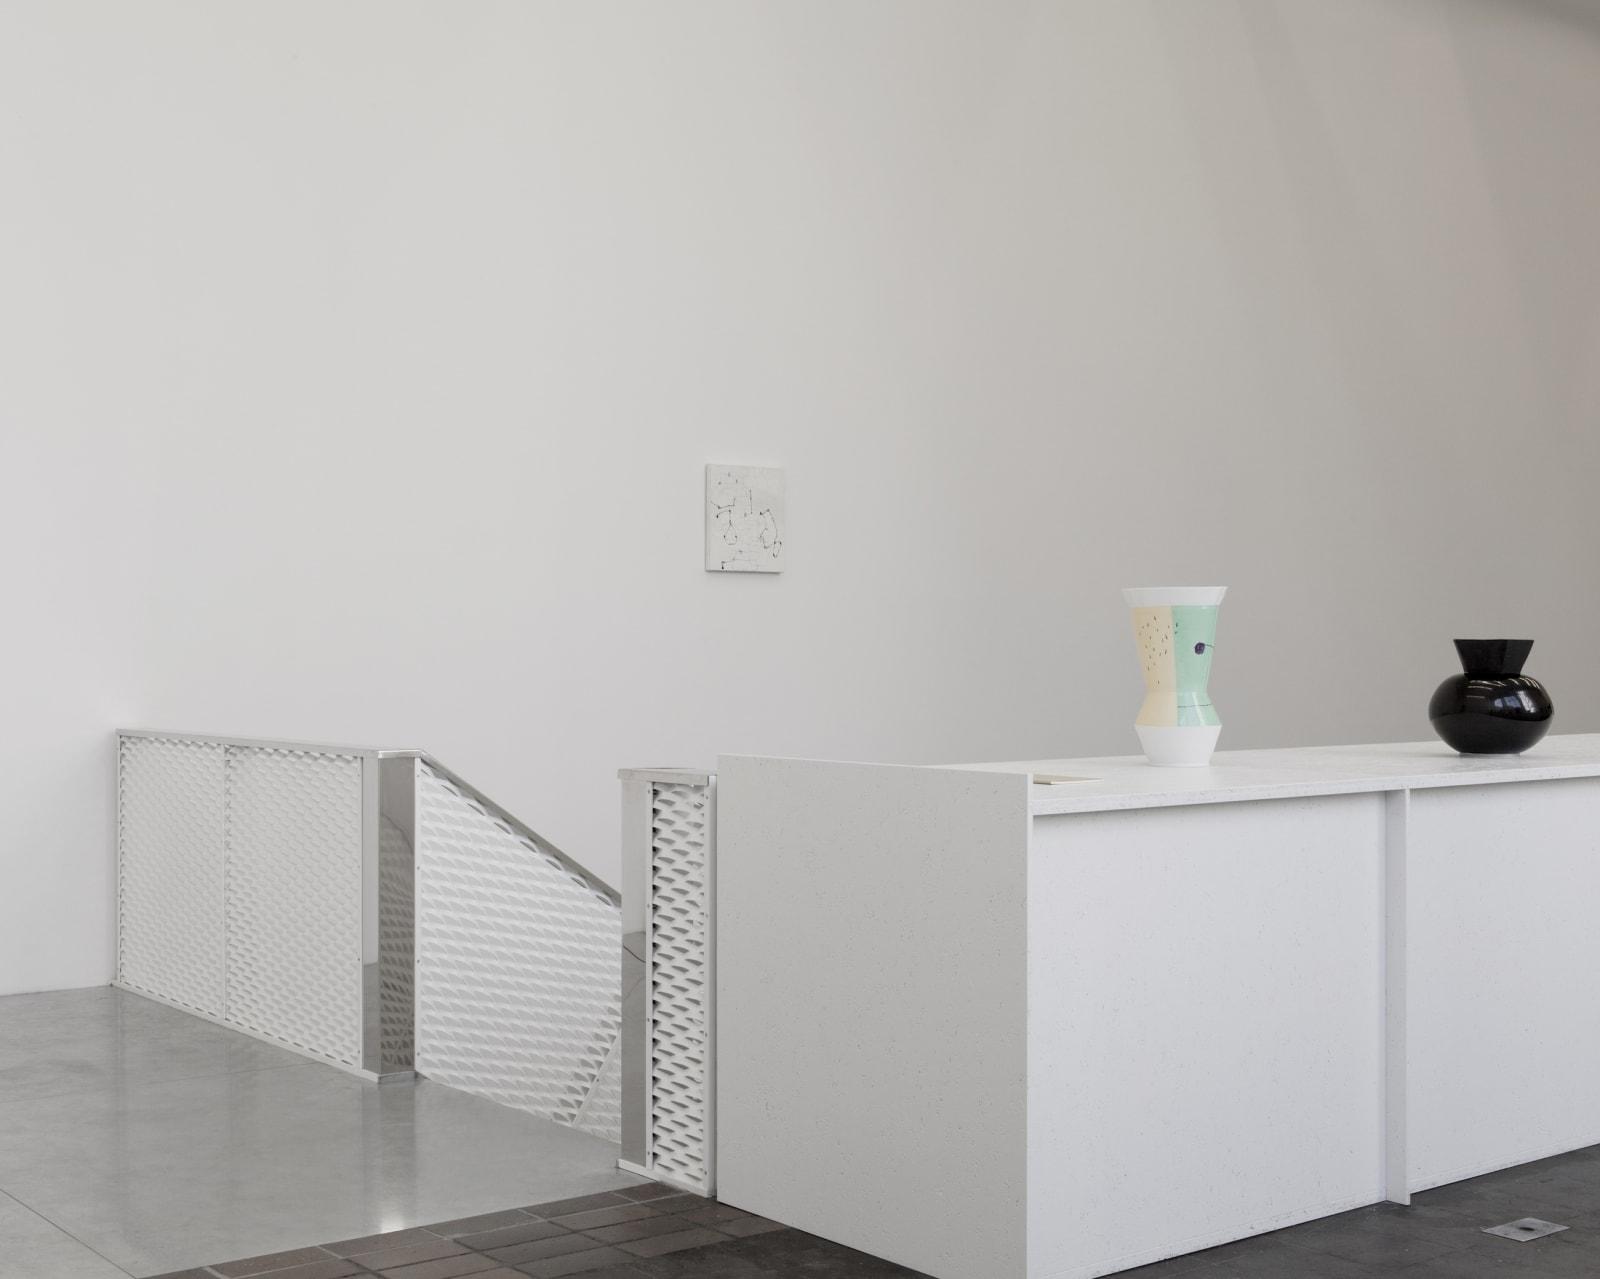 Installation view, Andreas Murkudis, Berlin (2011) | Photo: Benedikt Partenheimer